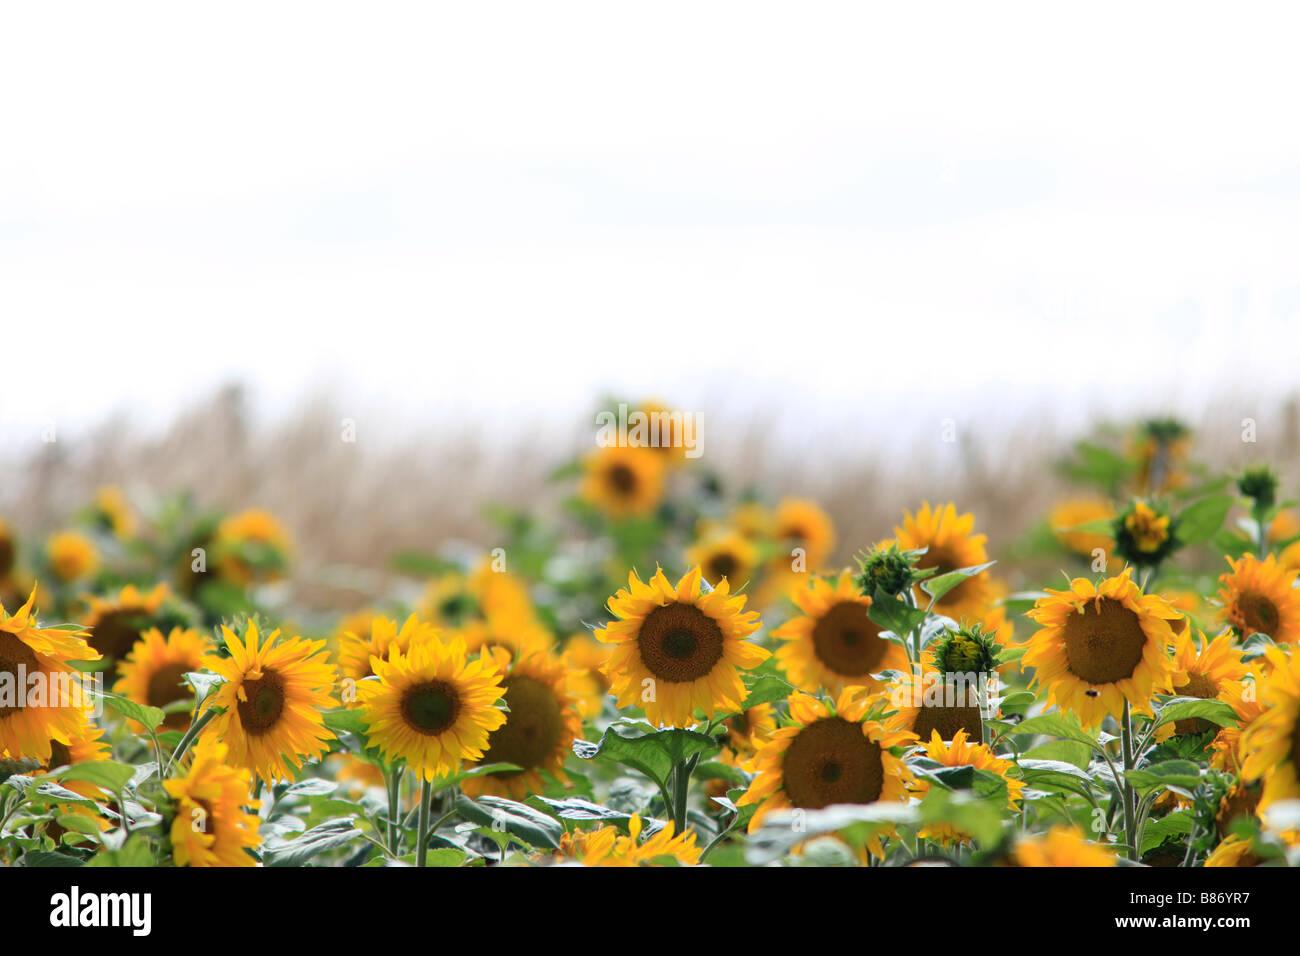 Sunflower heads in field,Oamaru, North Otago, South Island, New Zealand - Stock Image